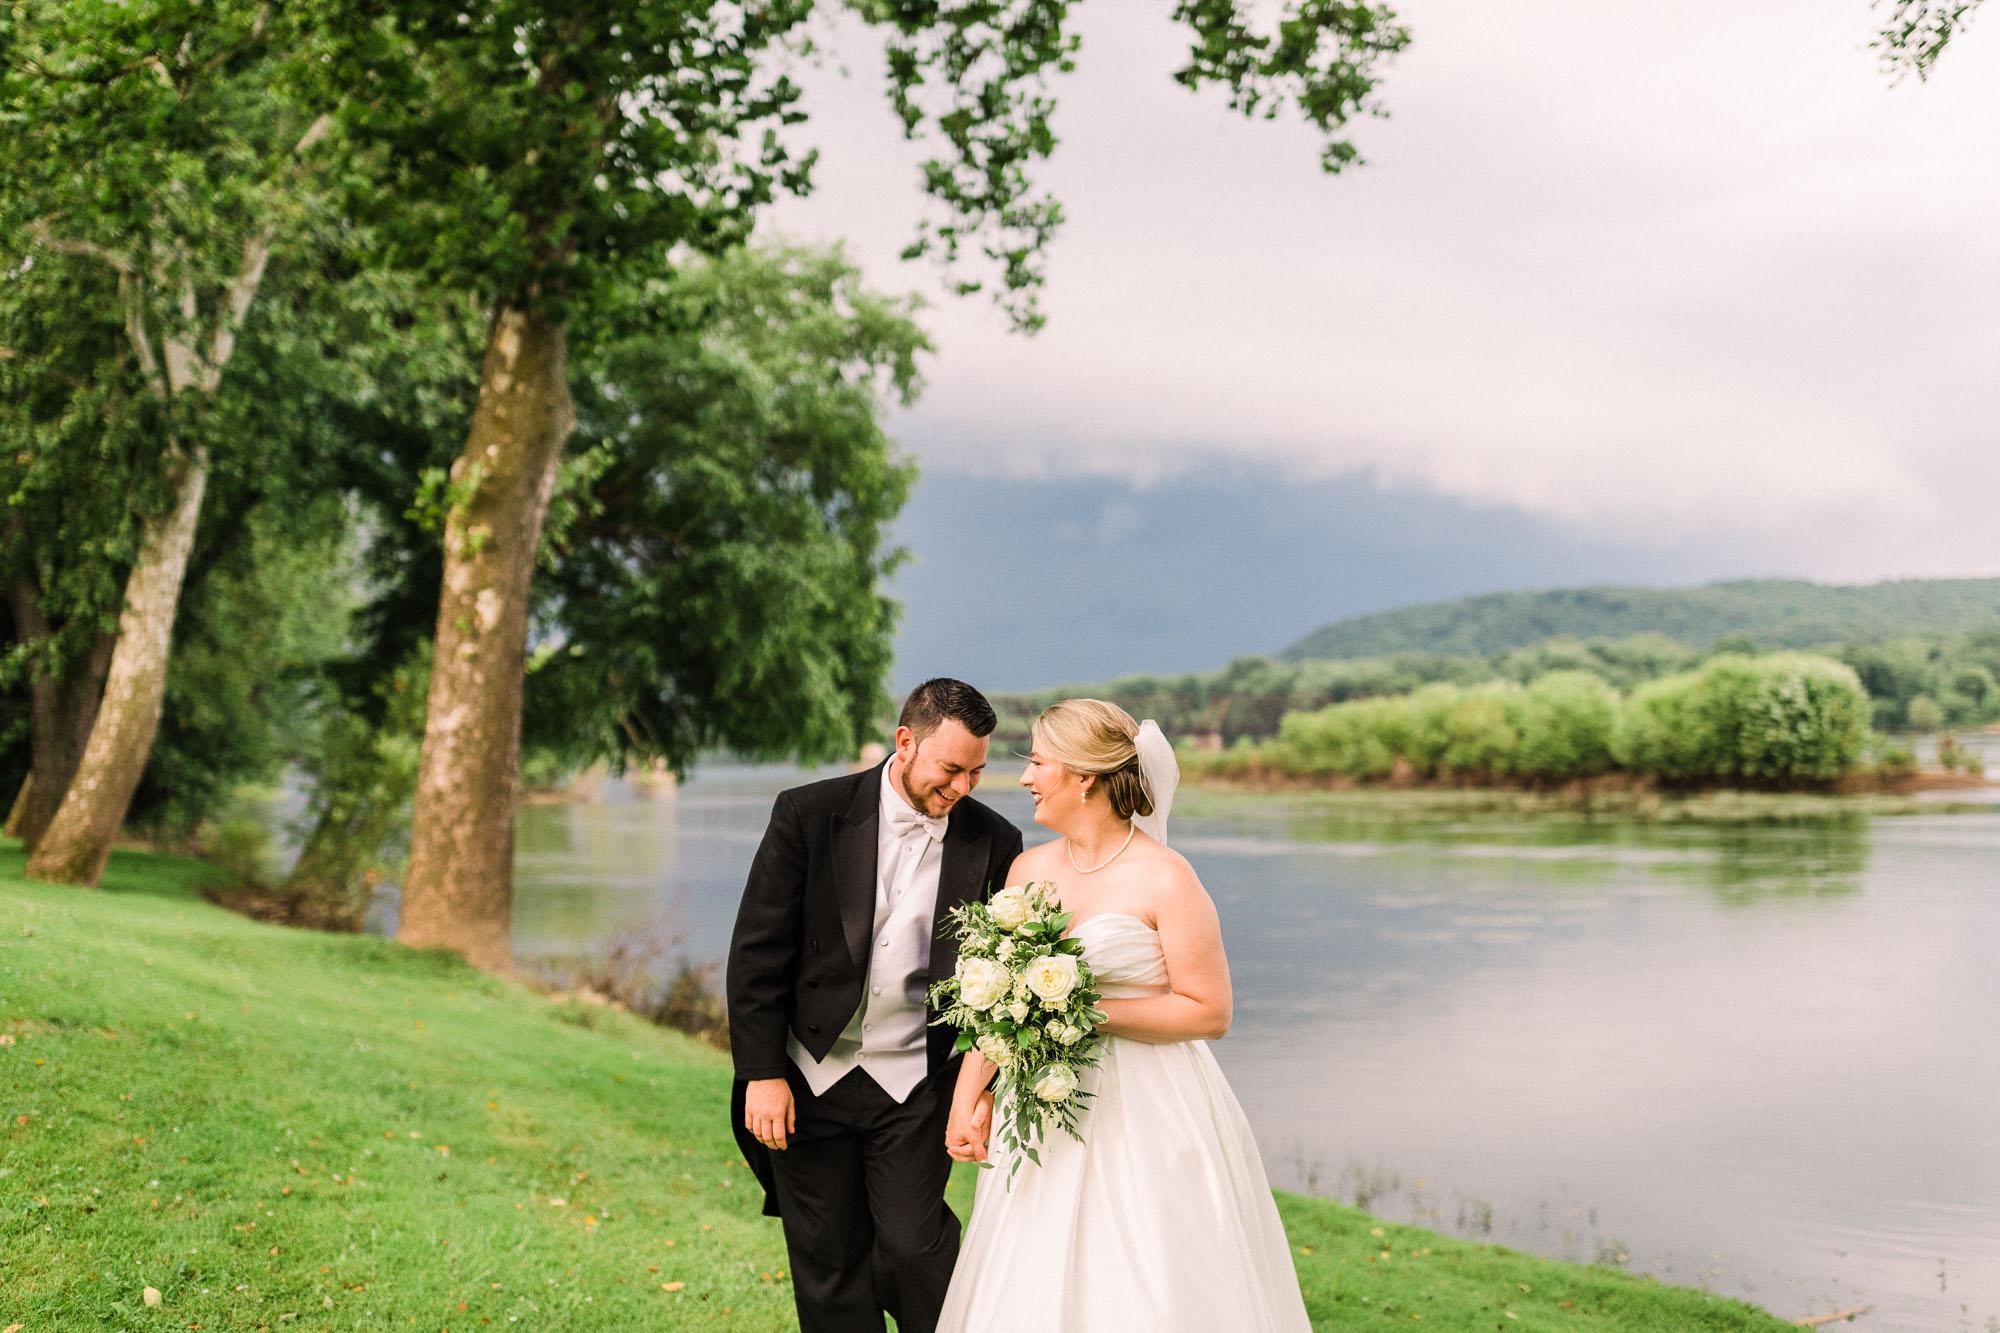 isle-of-que-wedding-6941.jpg